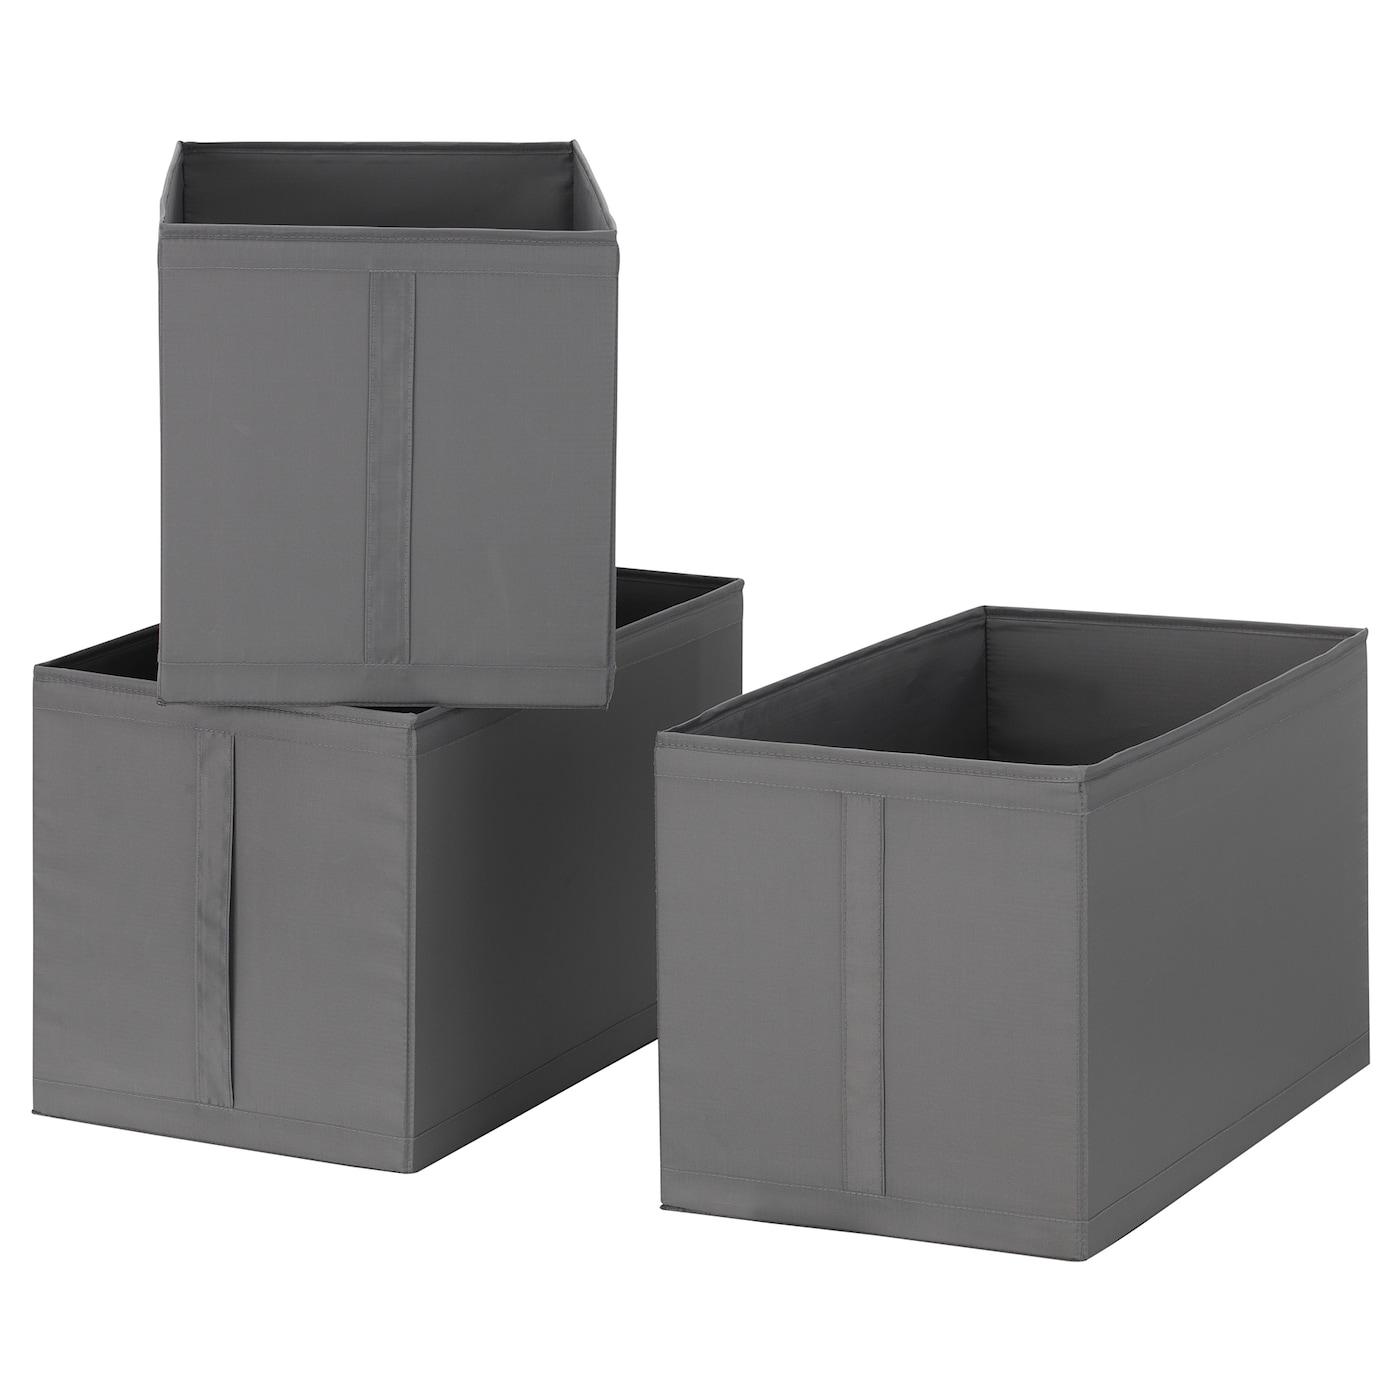 skubb box dark grey 31 x 55 x 33 cm ikea. Black Bedroom Furniture Sets. Home Design Ideas